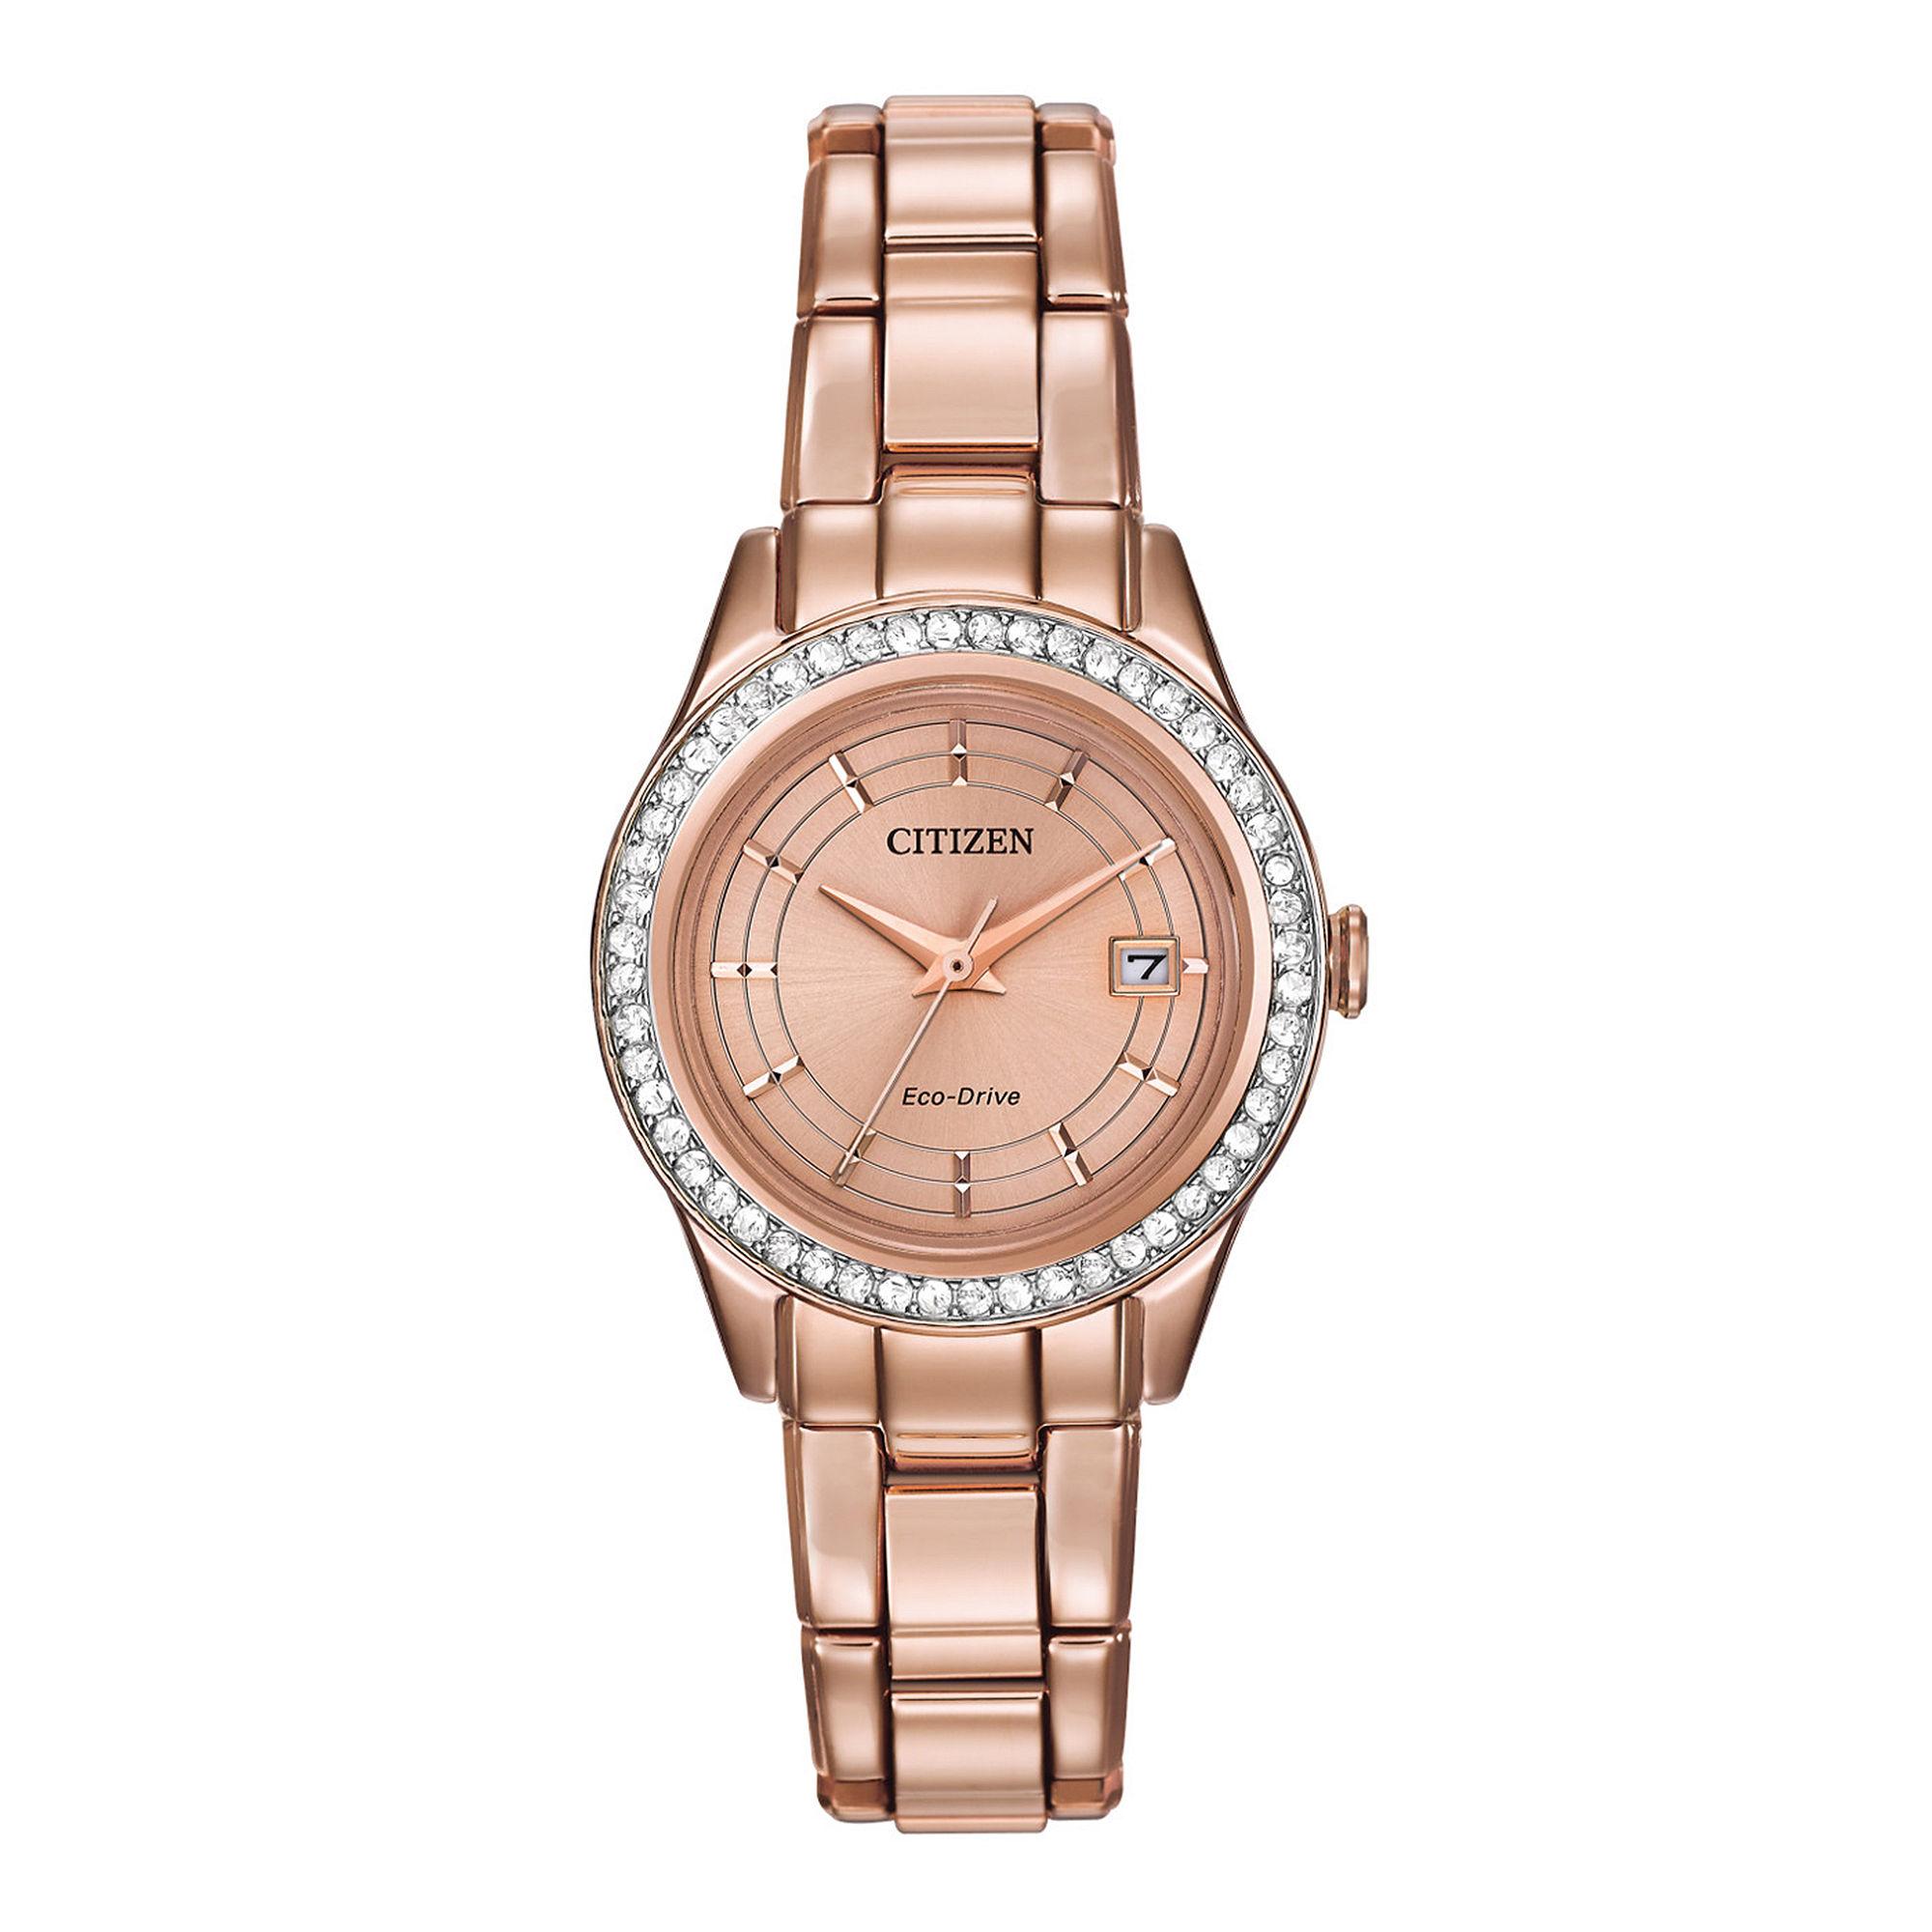 Citizen Eco-Drive Silhouette Womens Crystal-Accent Bracelet Watch FE1123-51Q